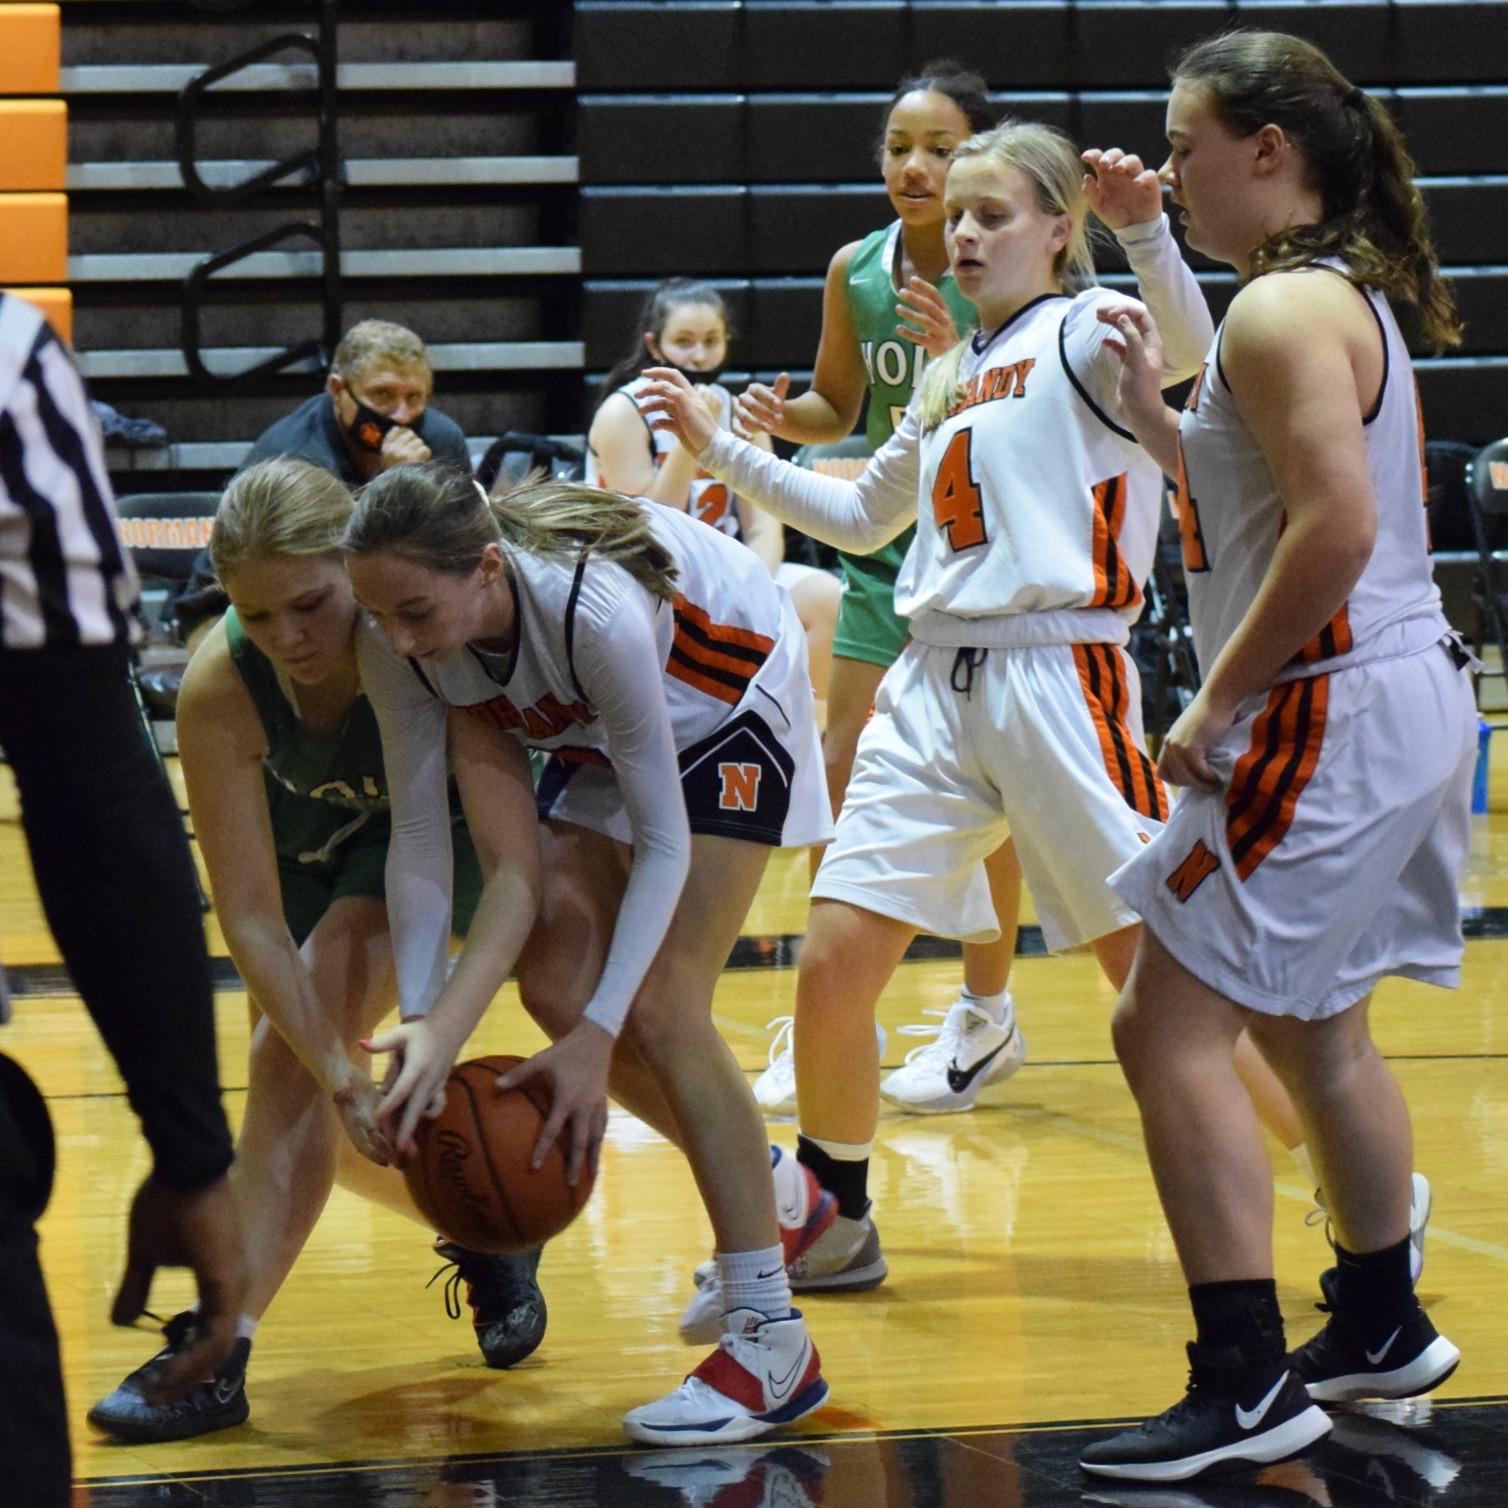 12/7/2020: JV Girls Basketball vs. Holy Name (Photo Credits: Dwayne Kessie)